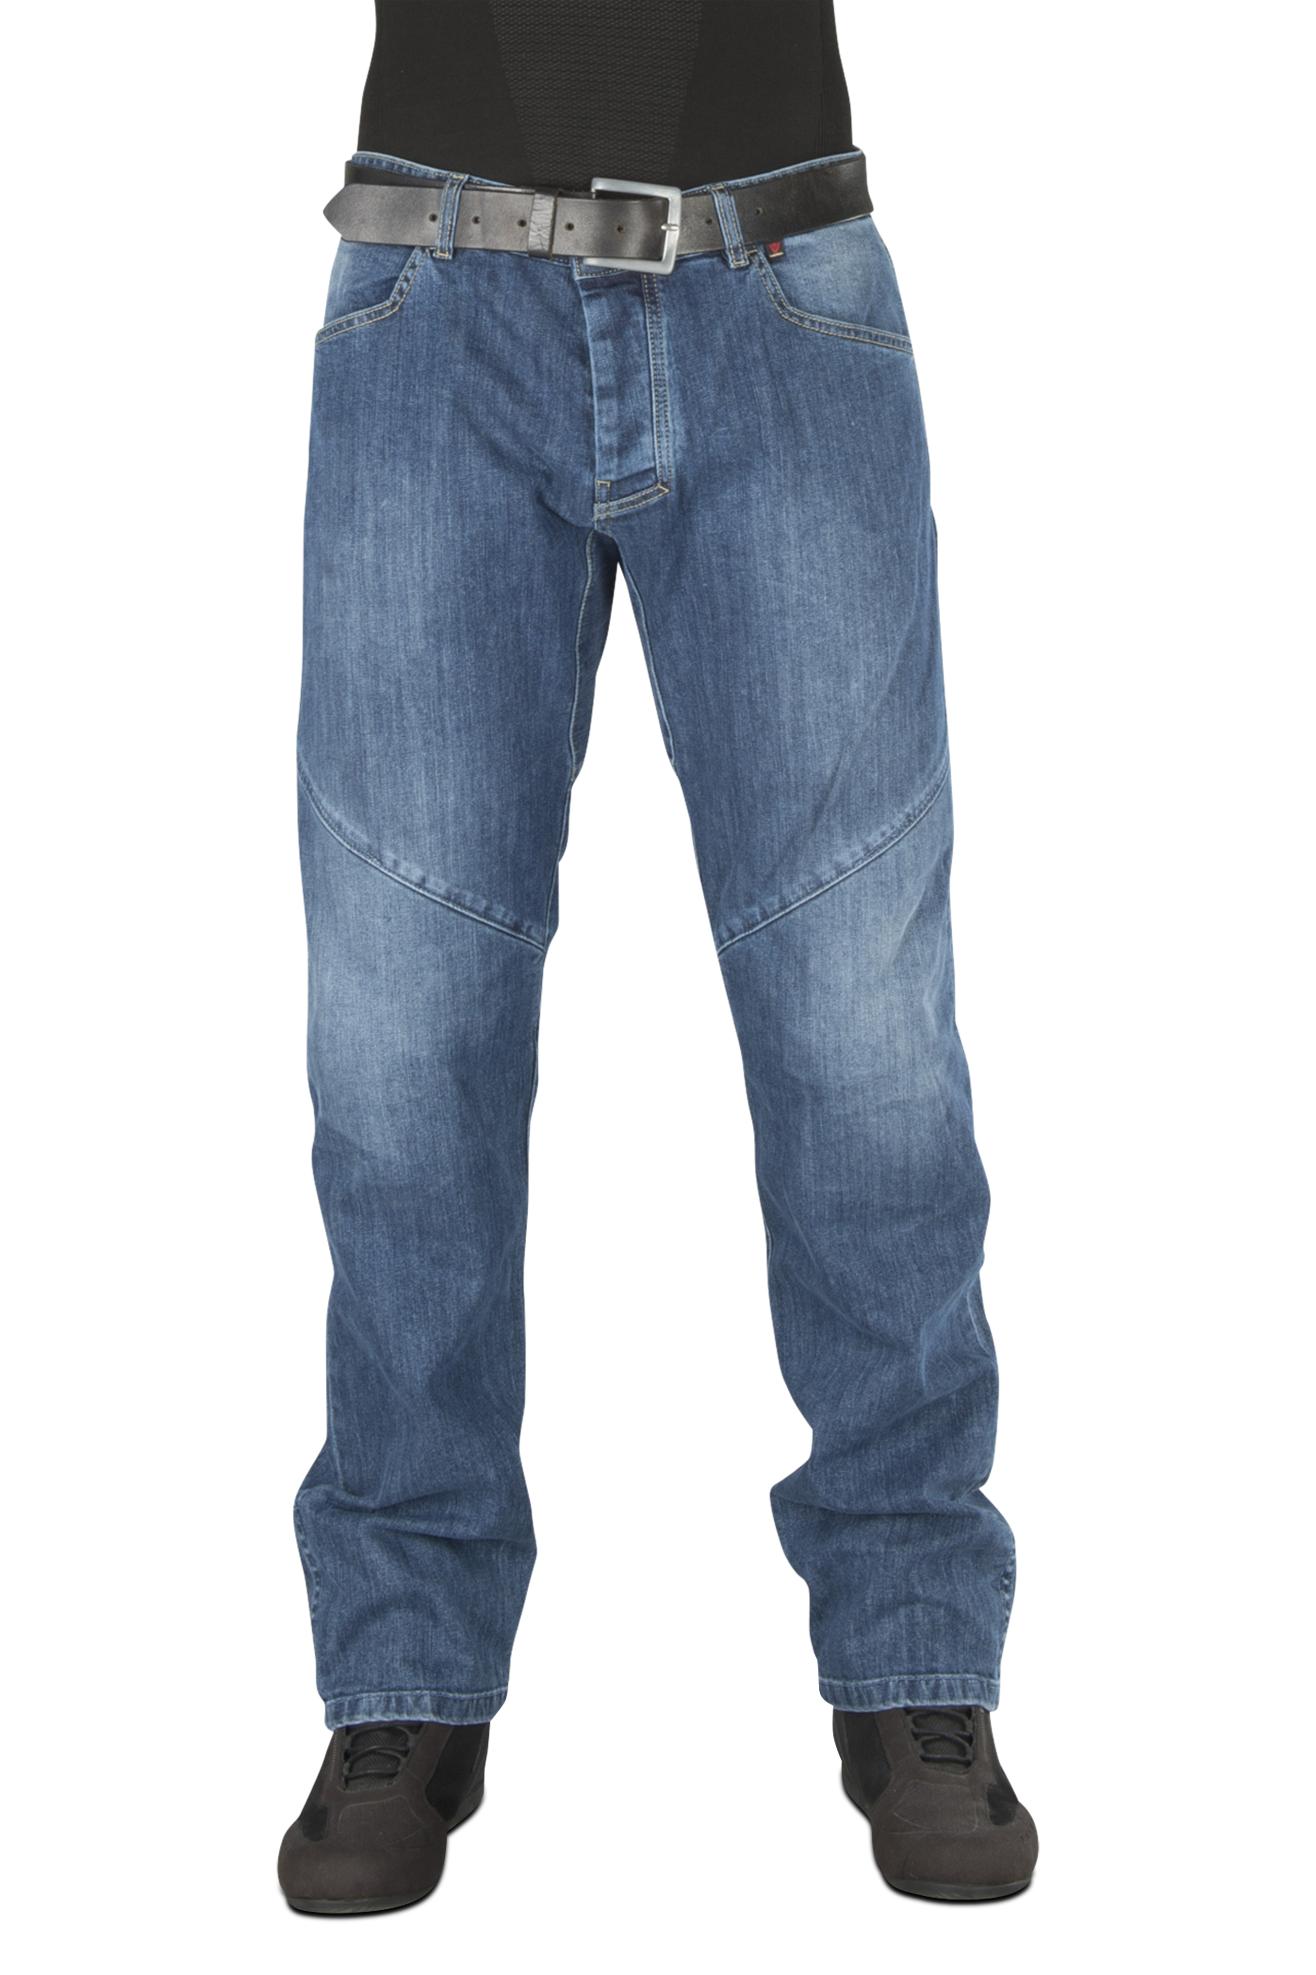 Dainese Jeans  Tivoli Slim Denim medio